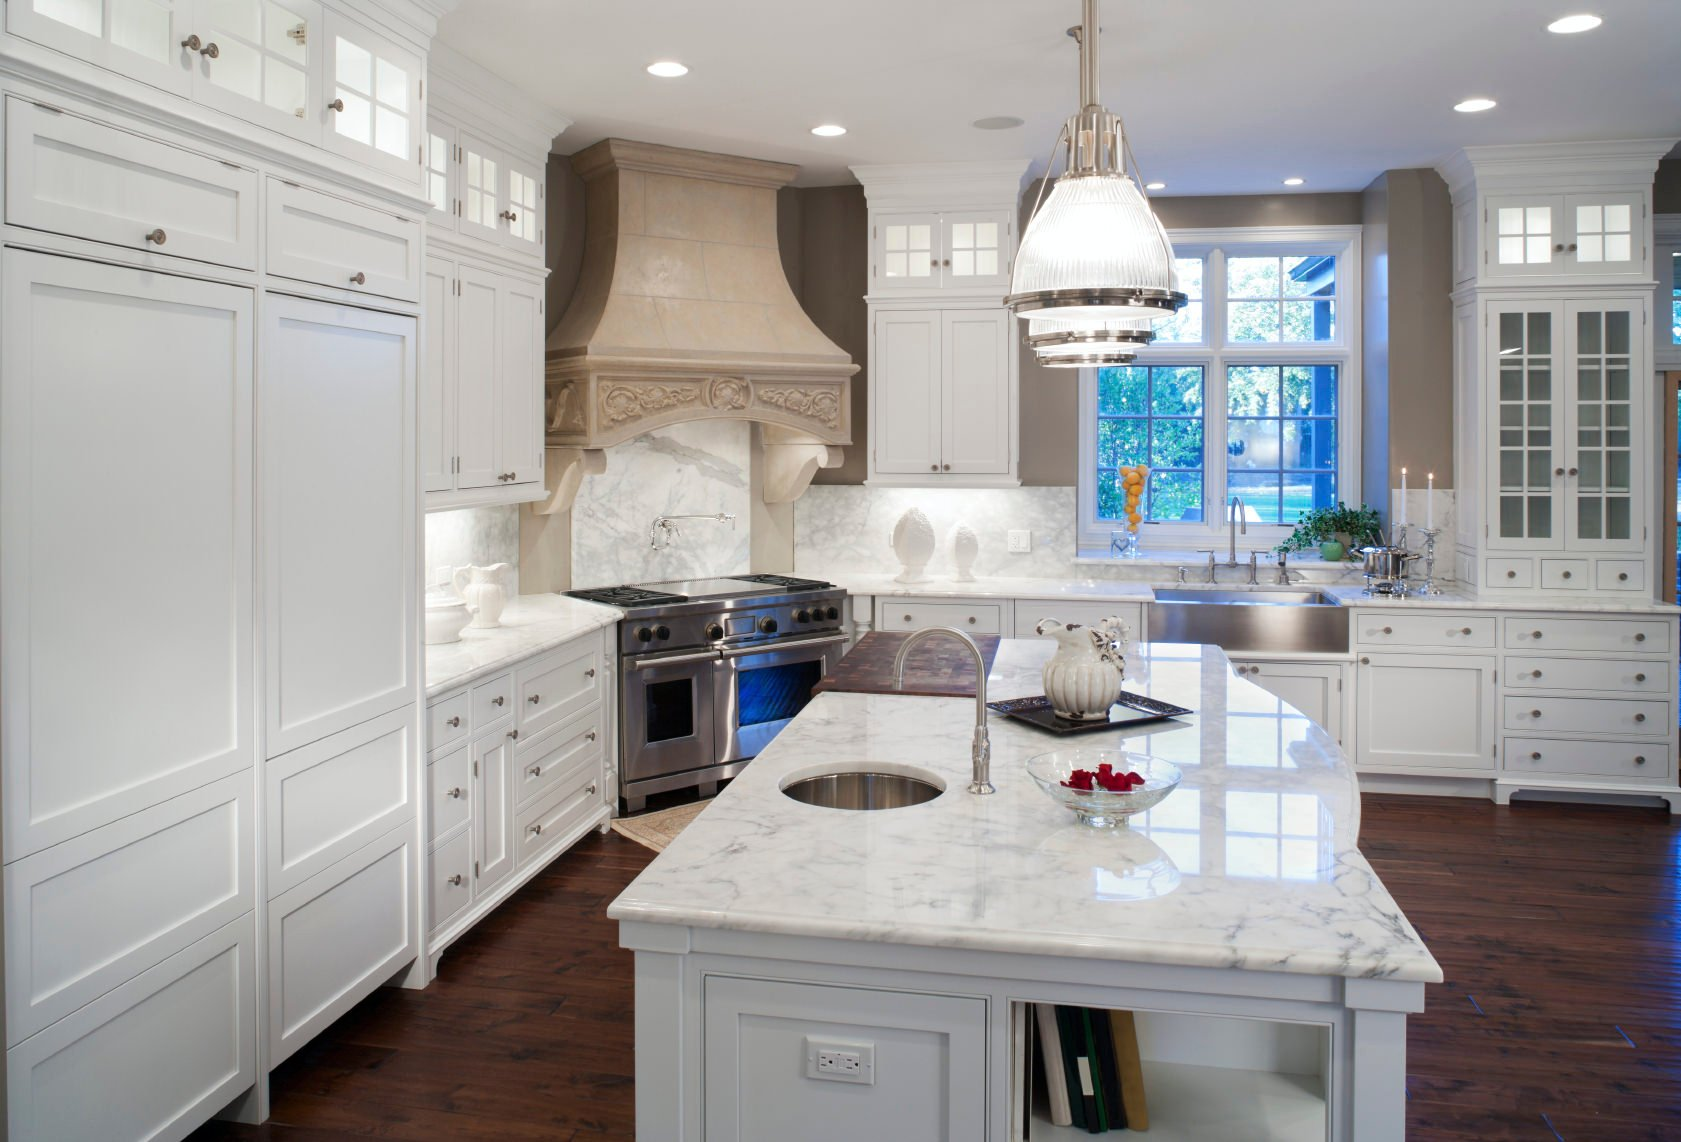 35 Transitional Kitchen Ideas Photos